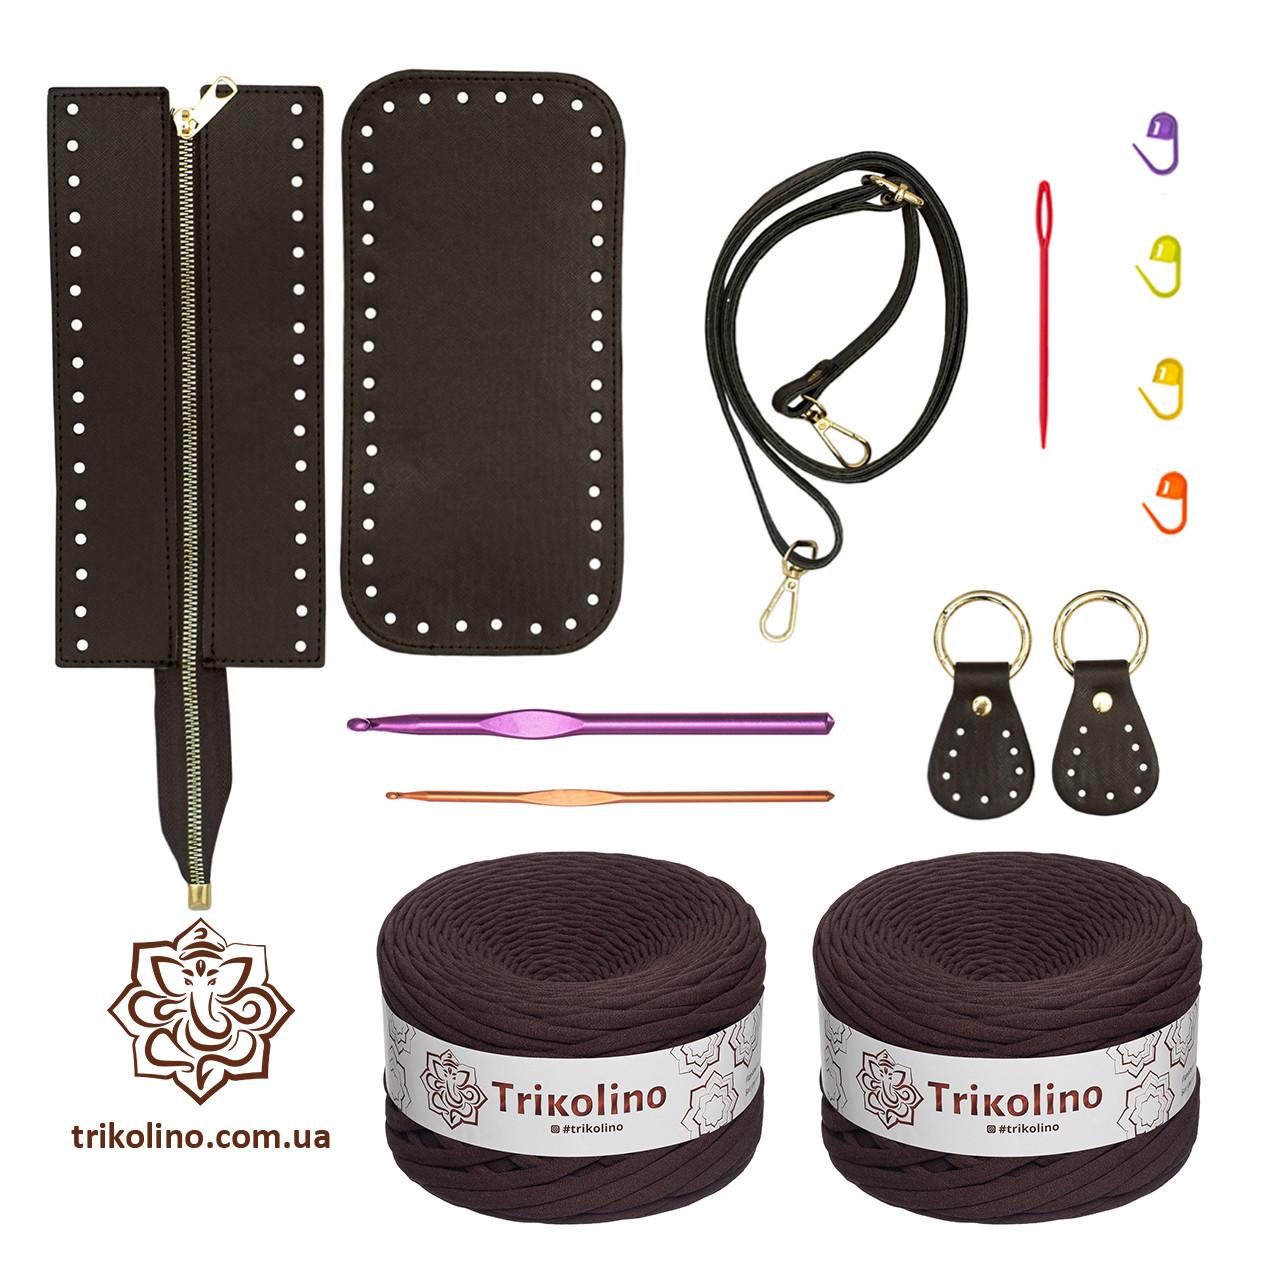 Набор для сумки Liberty, цвет Шоколад (пряжа - Шоколад)